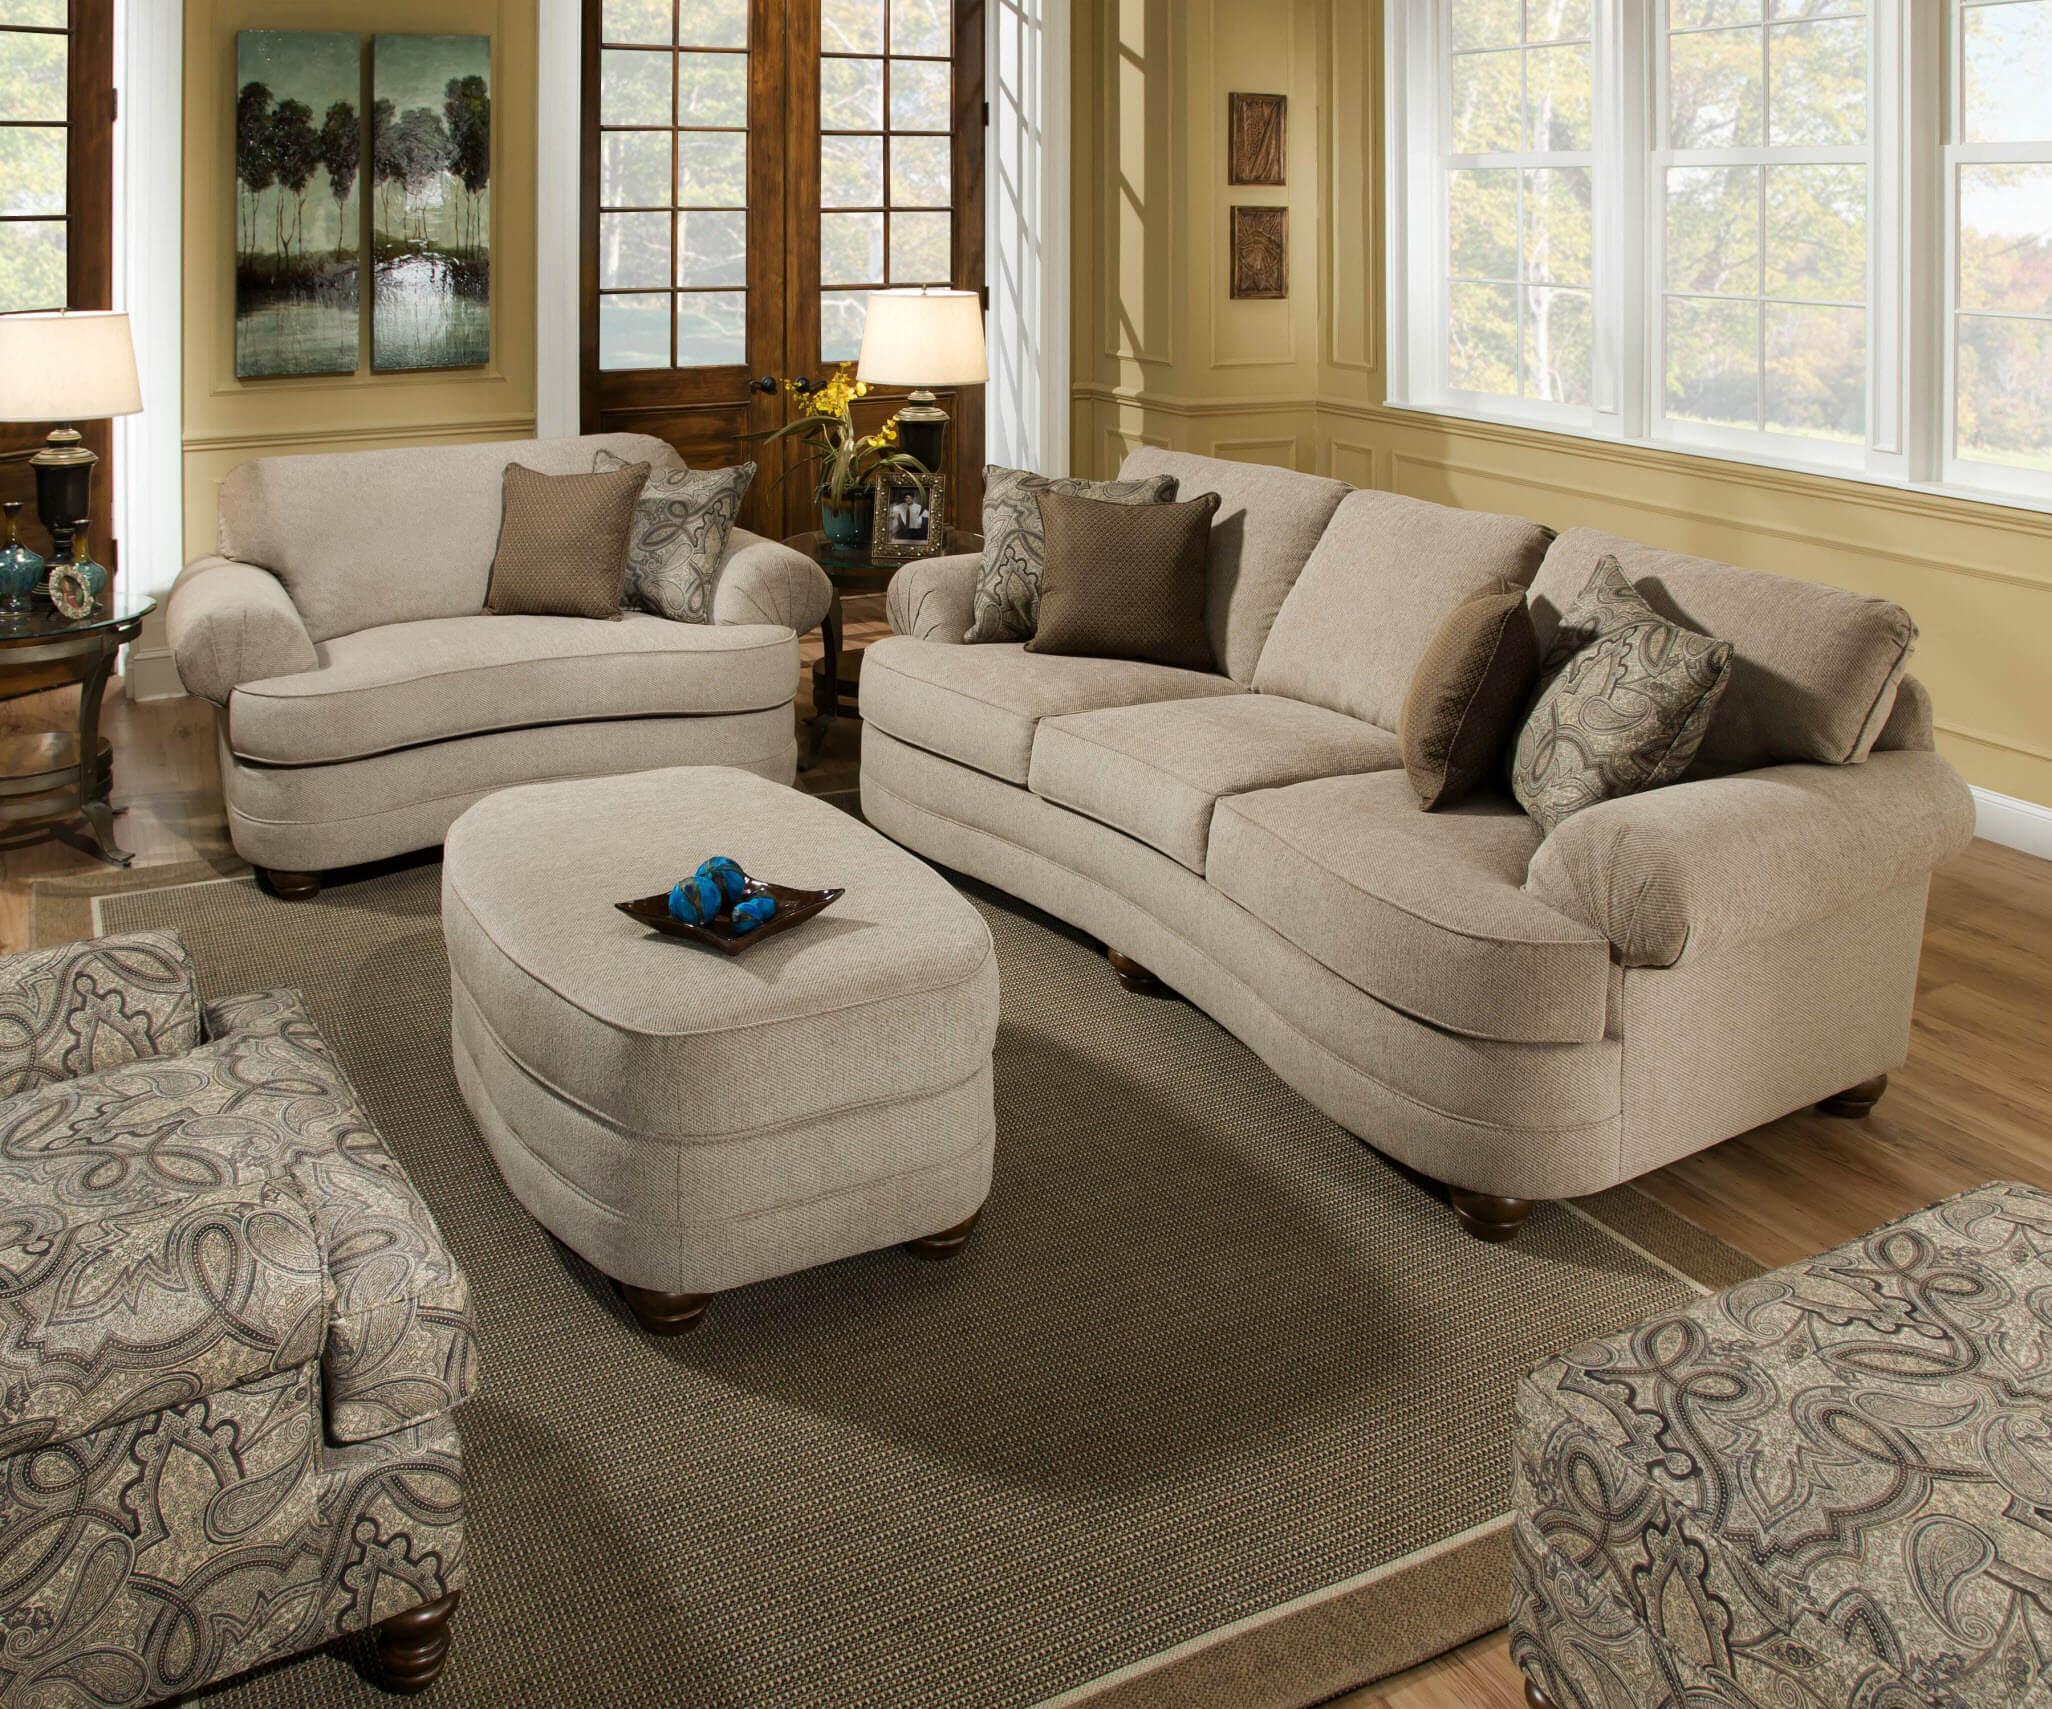 Nasharia Barley Sofa and Chair | Fabric Living Room Sets